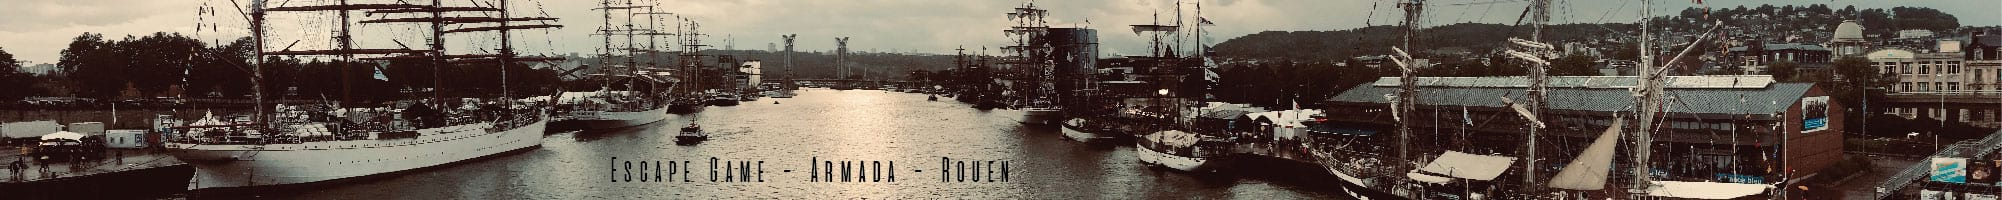 Escape Game Armada Rouen 2019